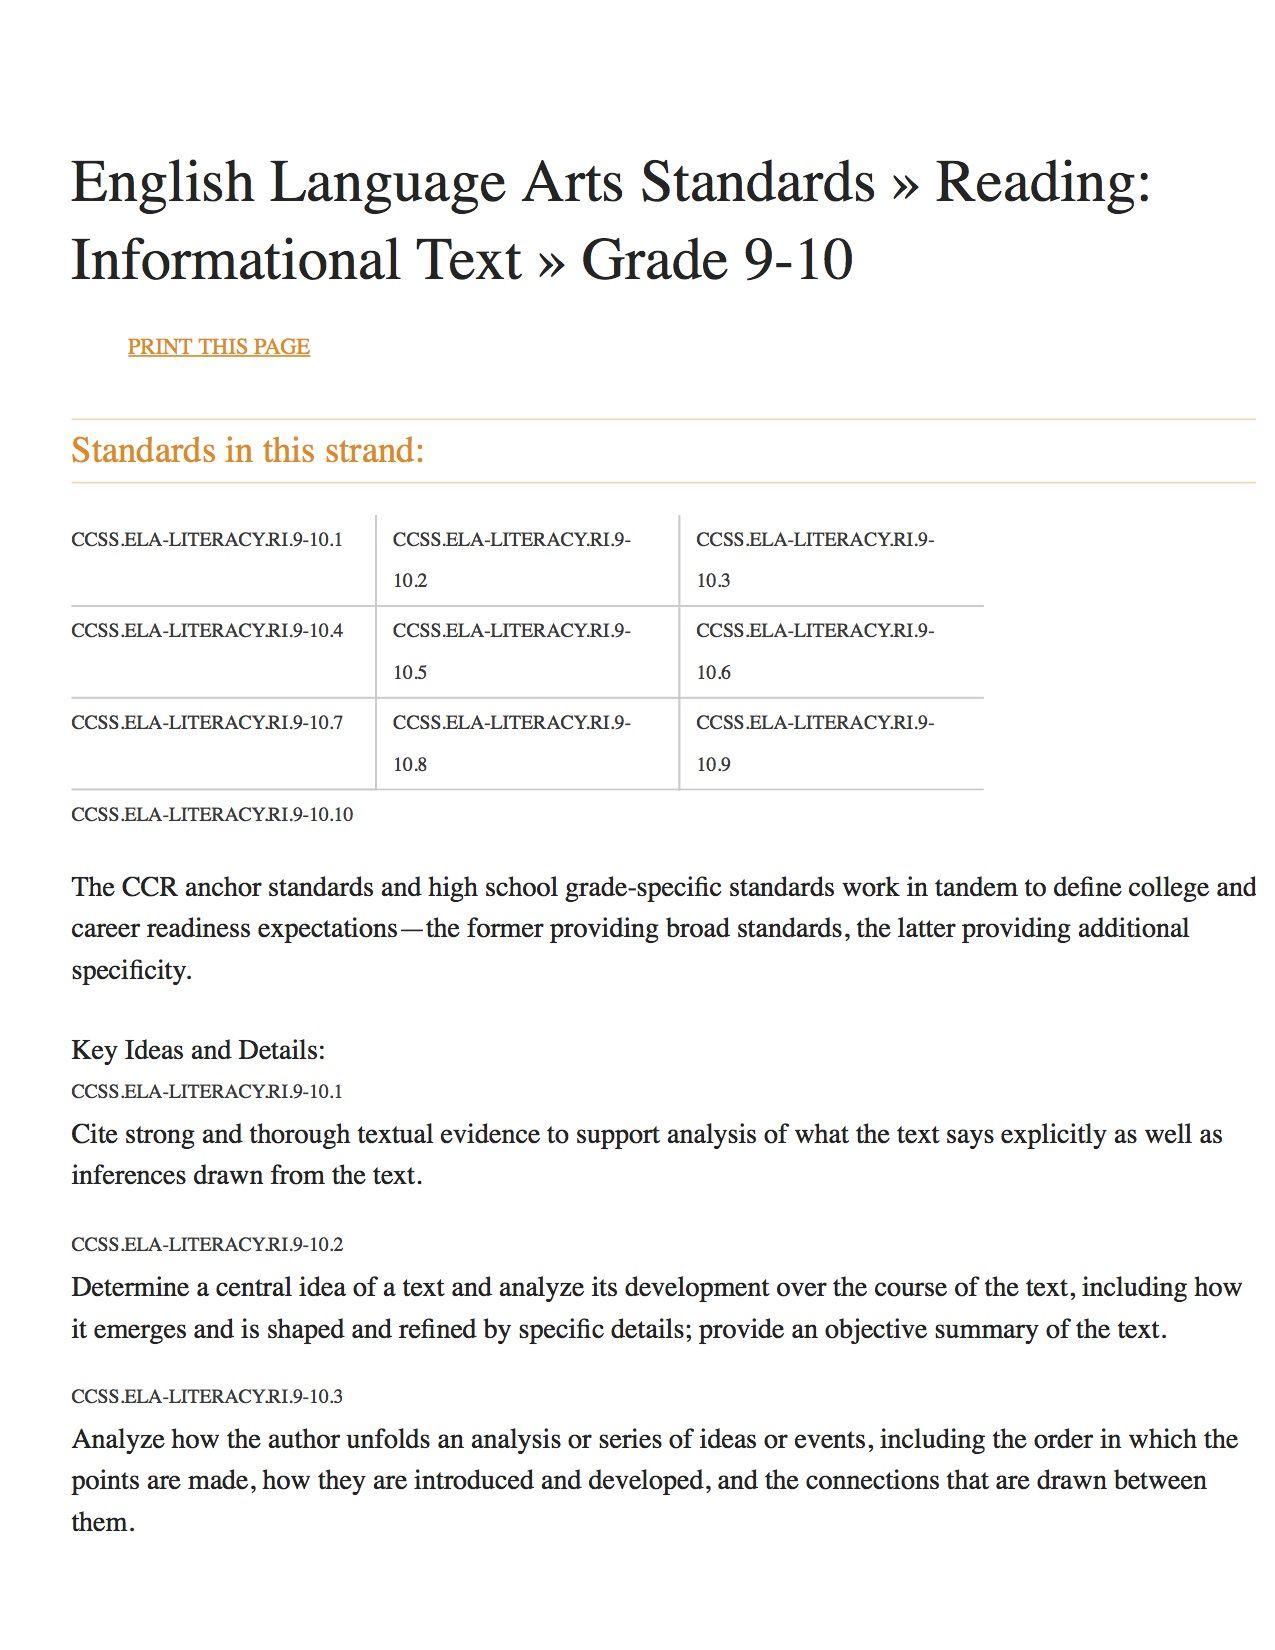 english language arts standards reading informational - HD1275×1650